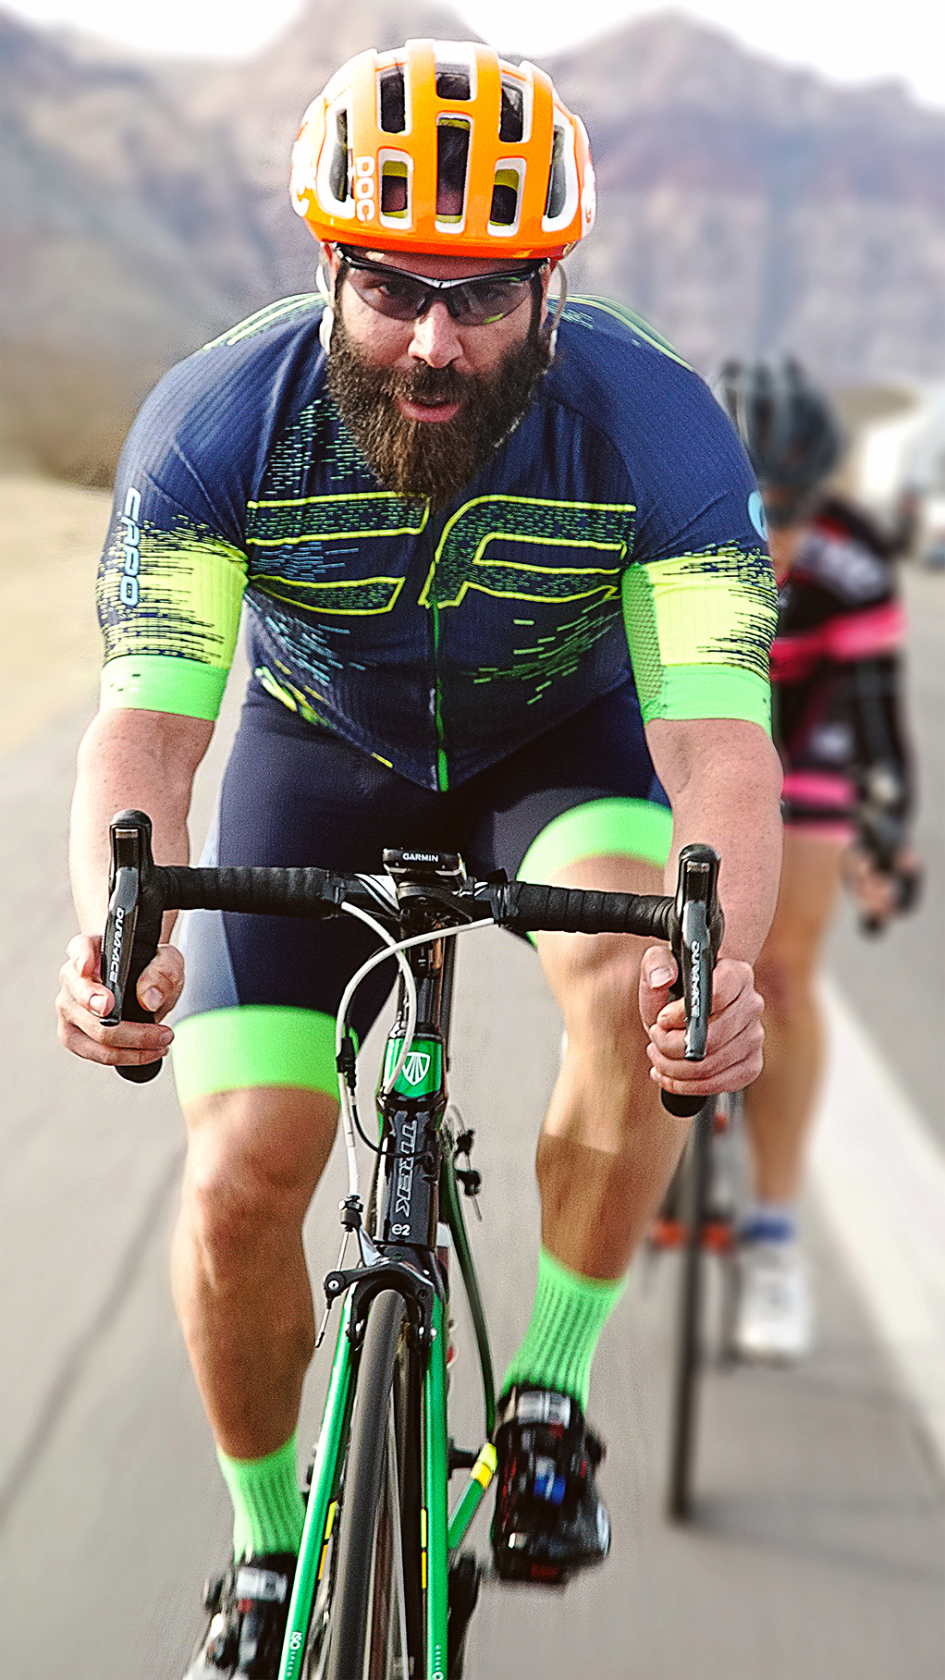 Bilzerian auf dem Fahrrad